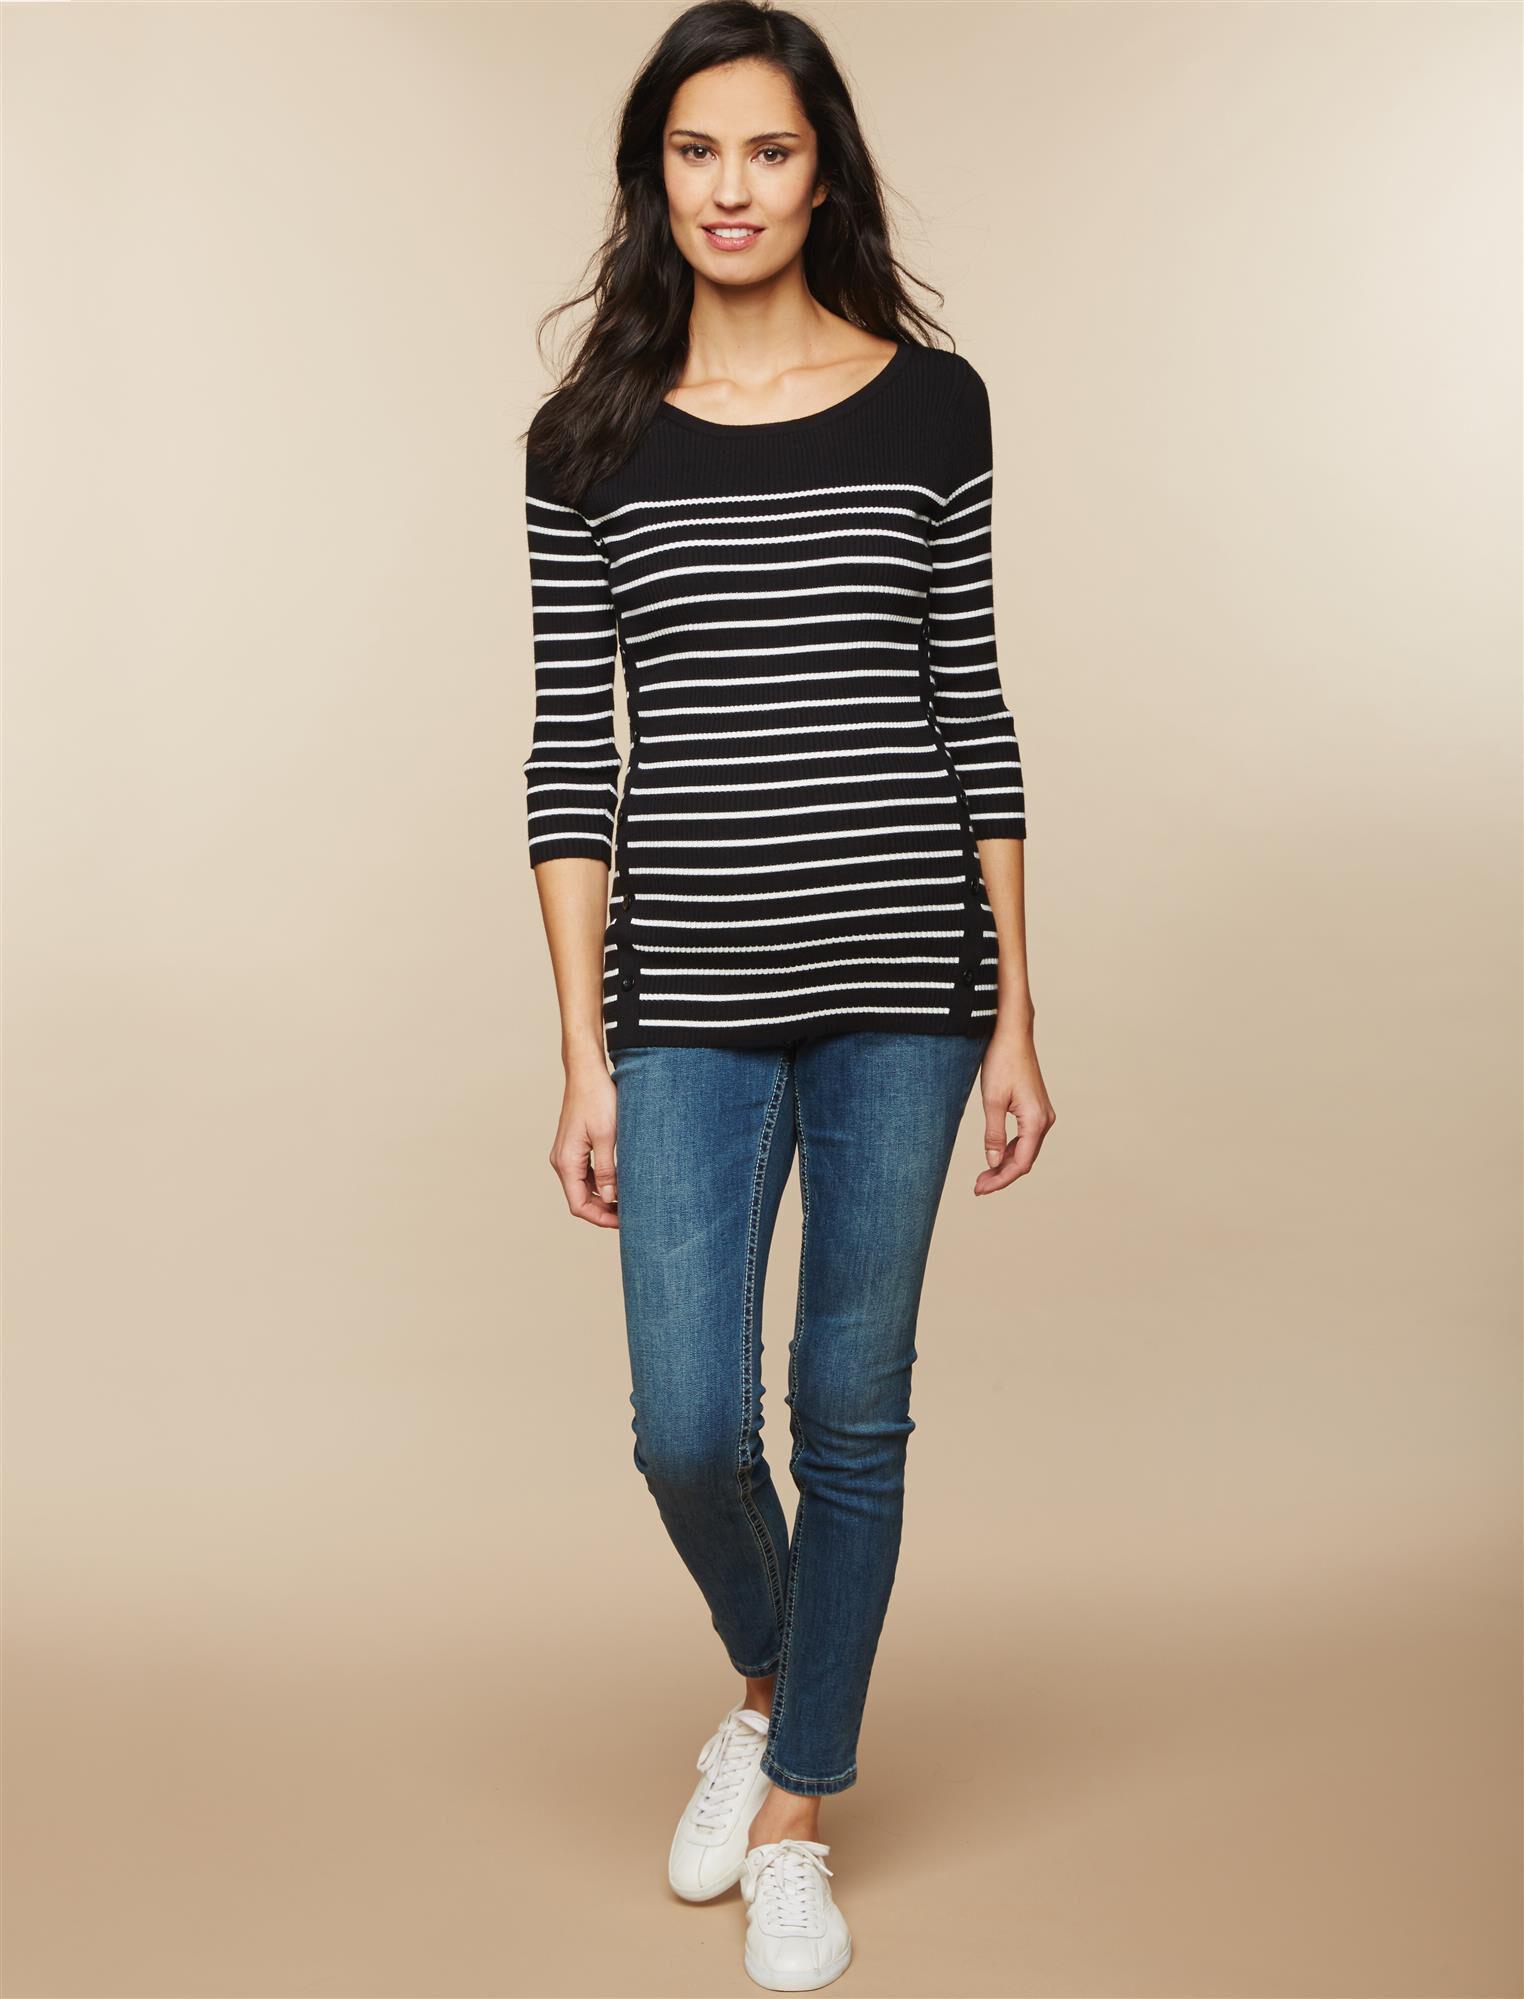 Secret Fit Belly Skinny Leg Maternity Jeans